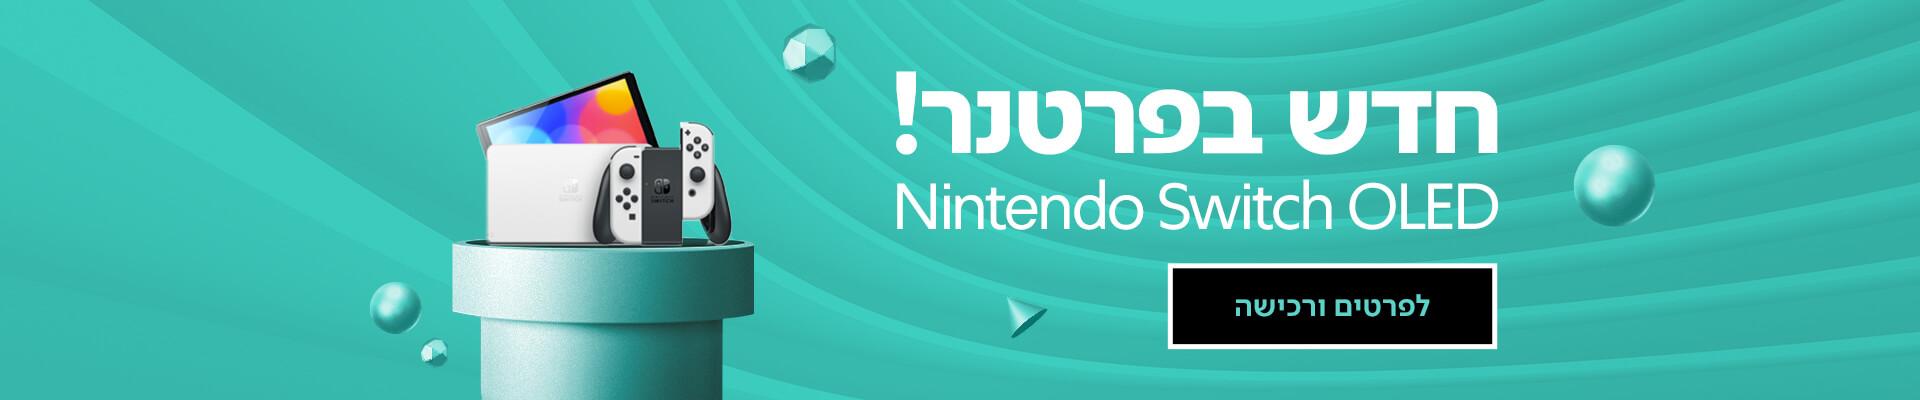 1920X400 Nintendo